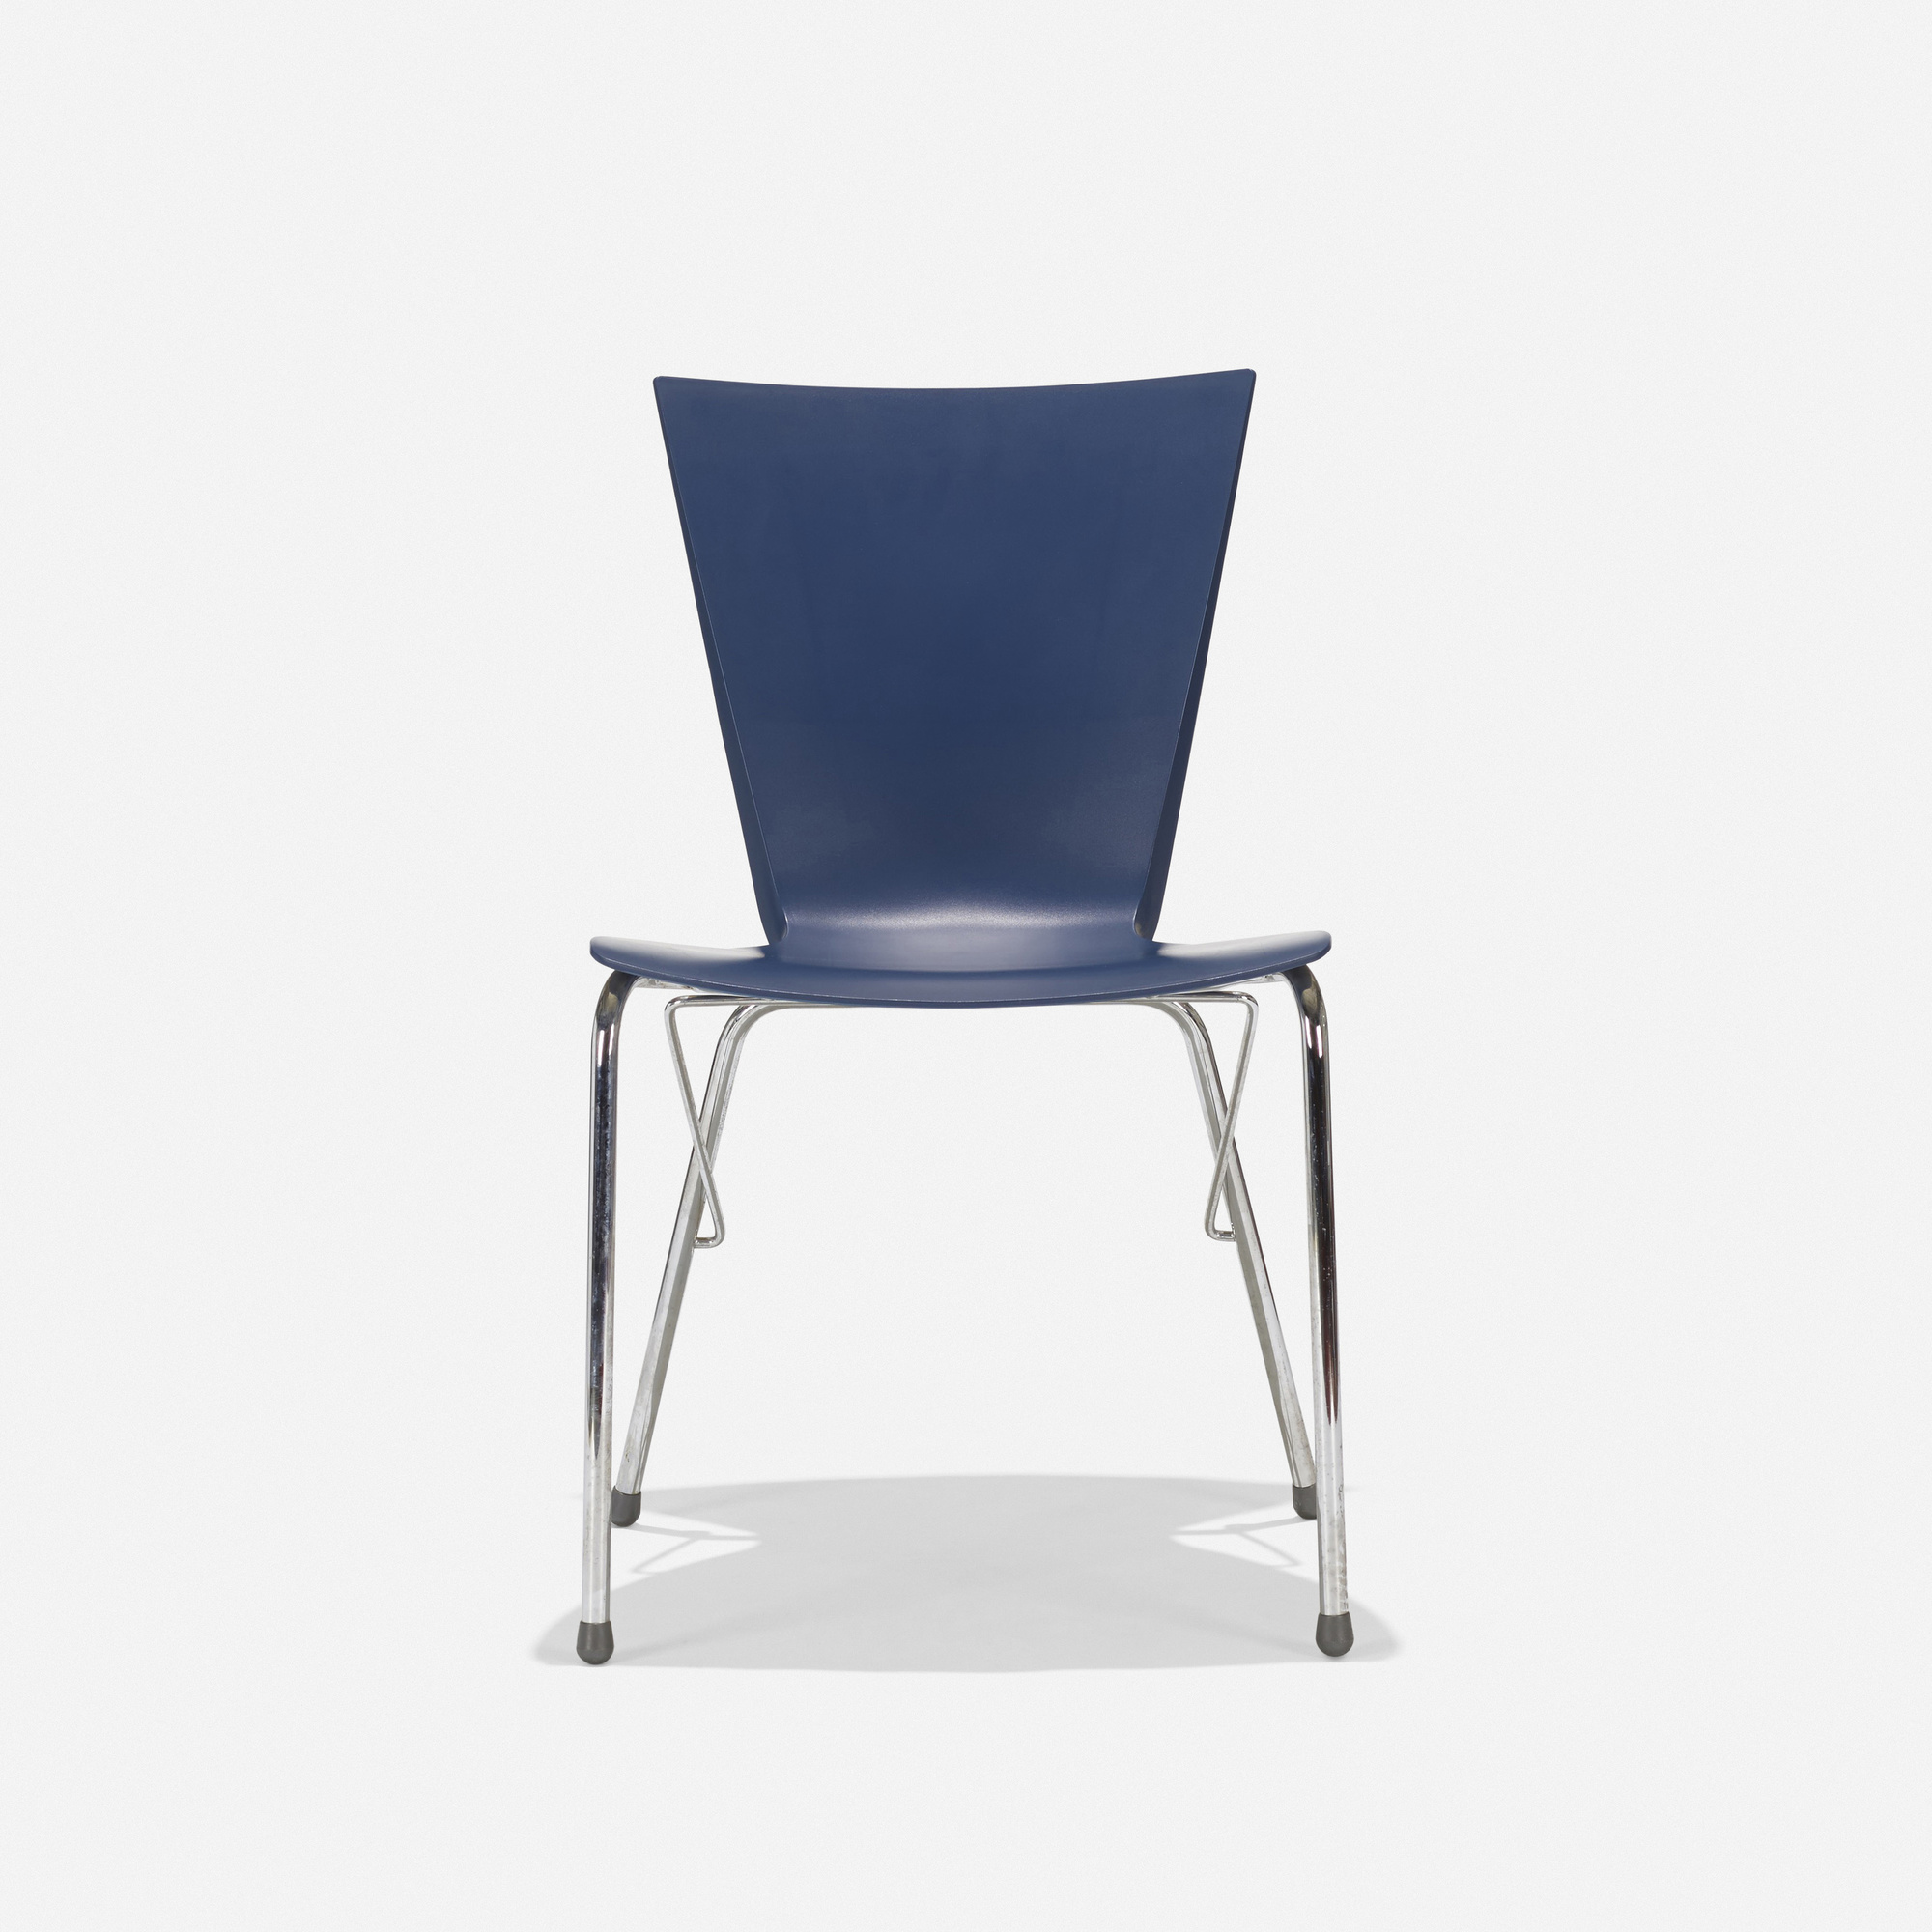 102: Carlo Bartoli / Storm chair (2 of 3)